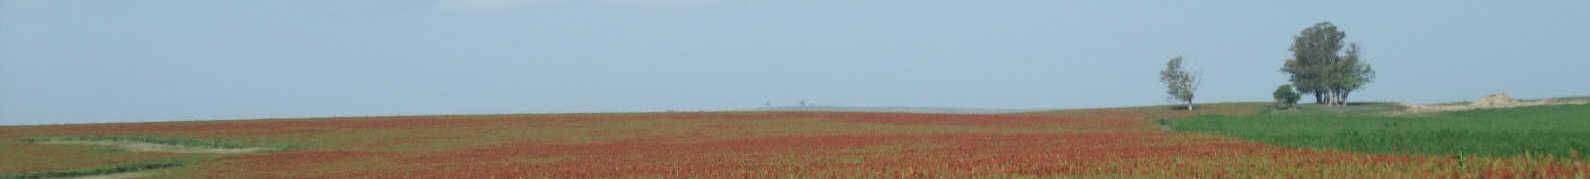 Uruguay Farmland